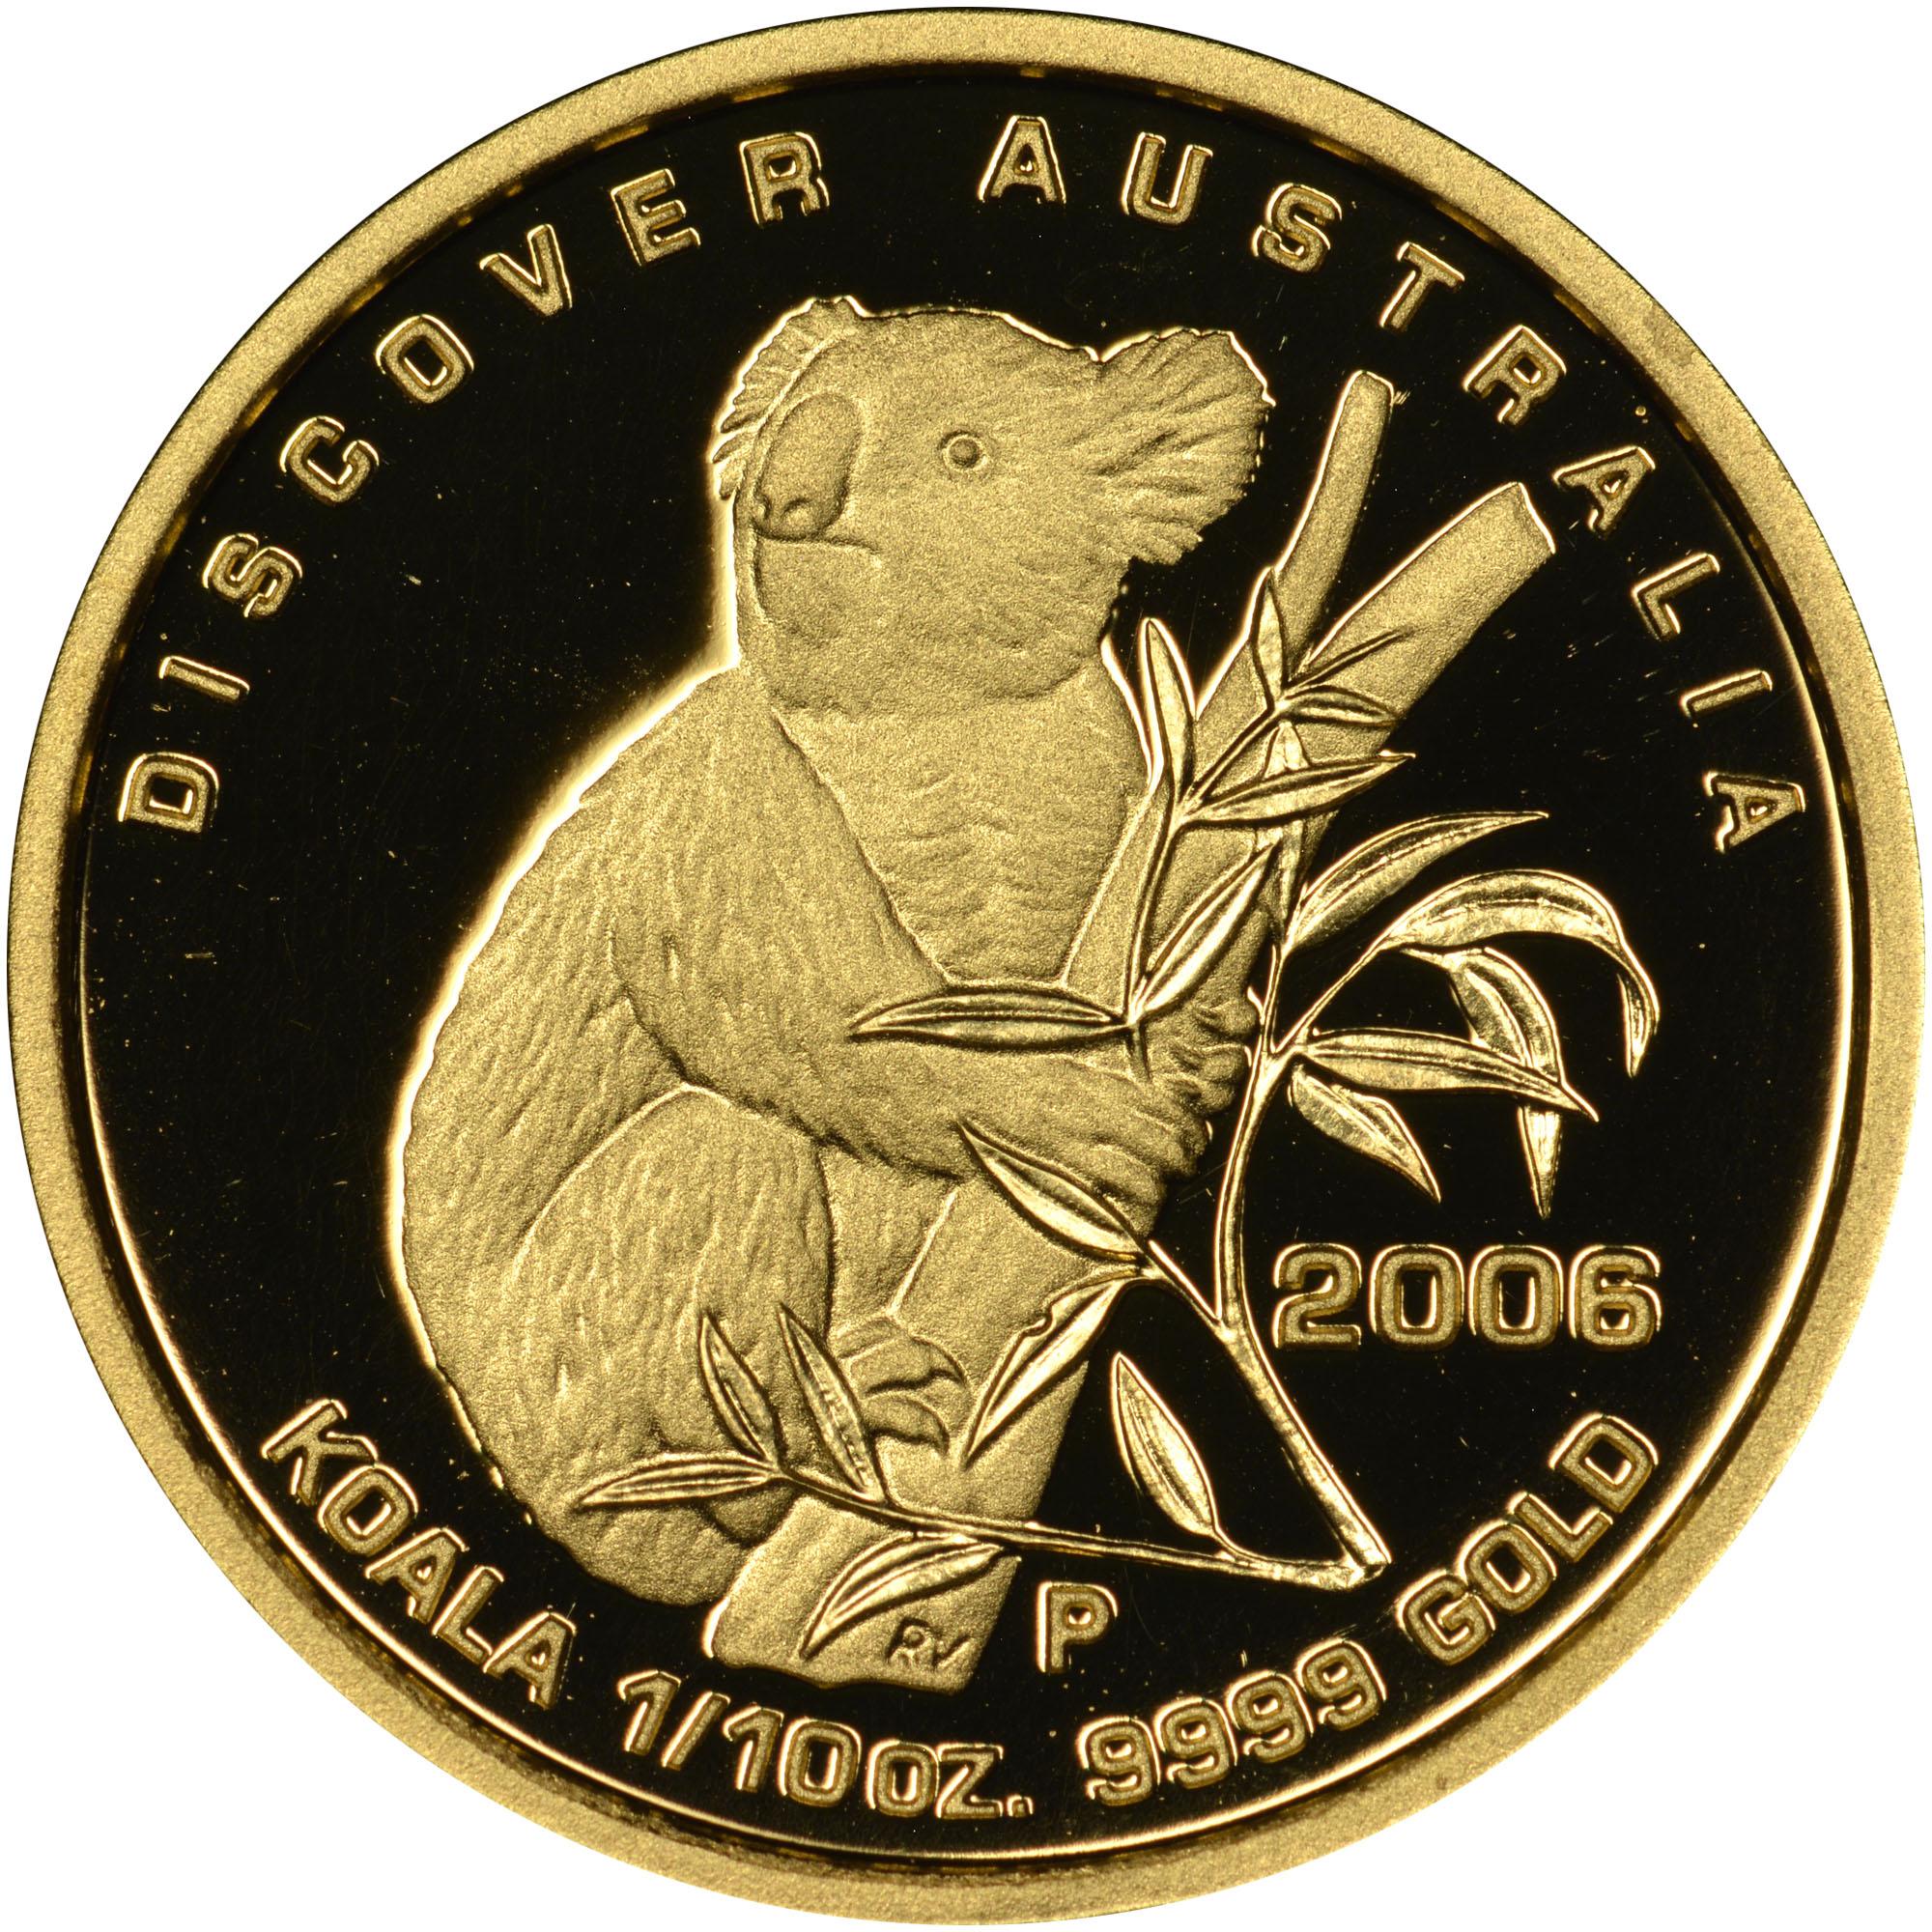 2006 Australia 15 Dollars reverse